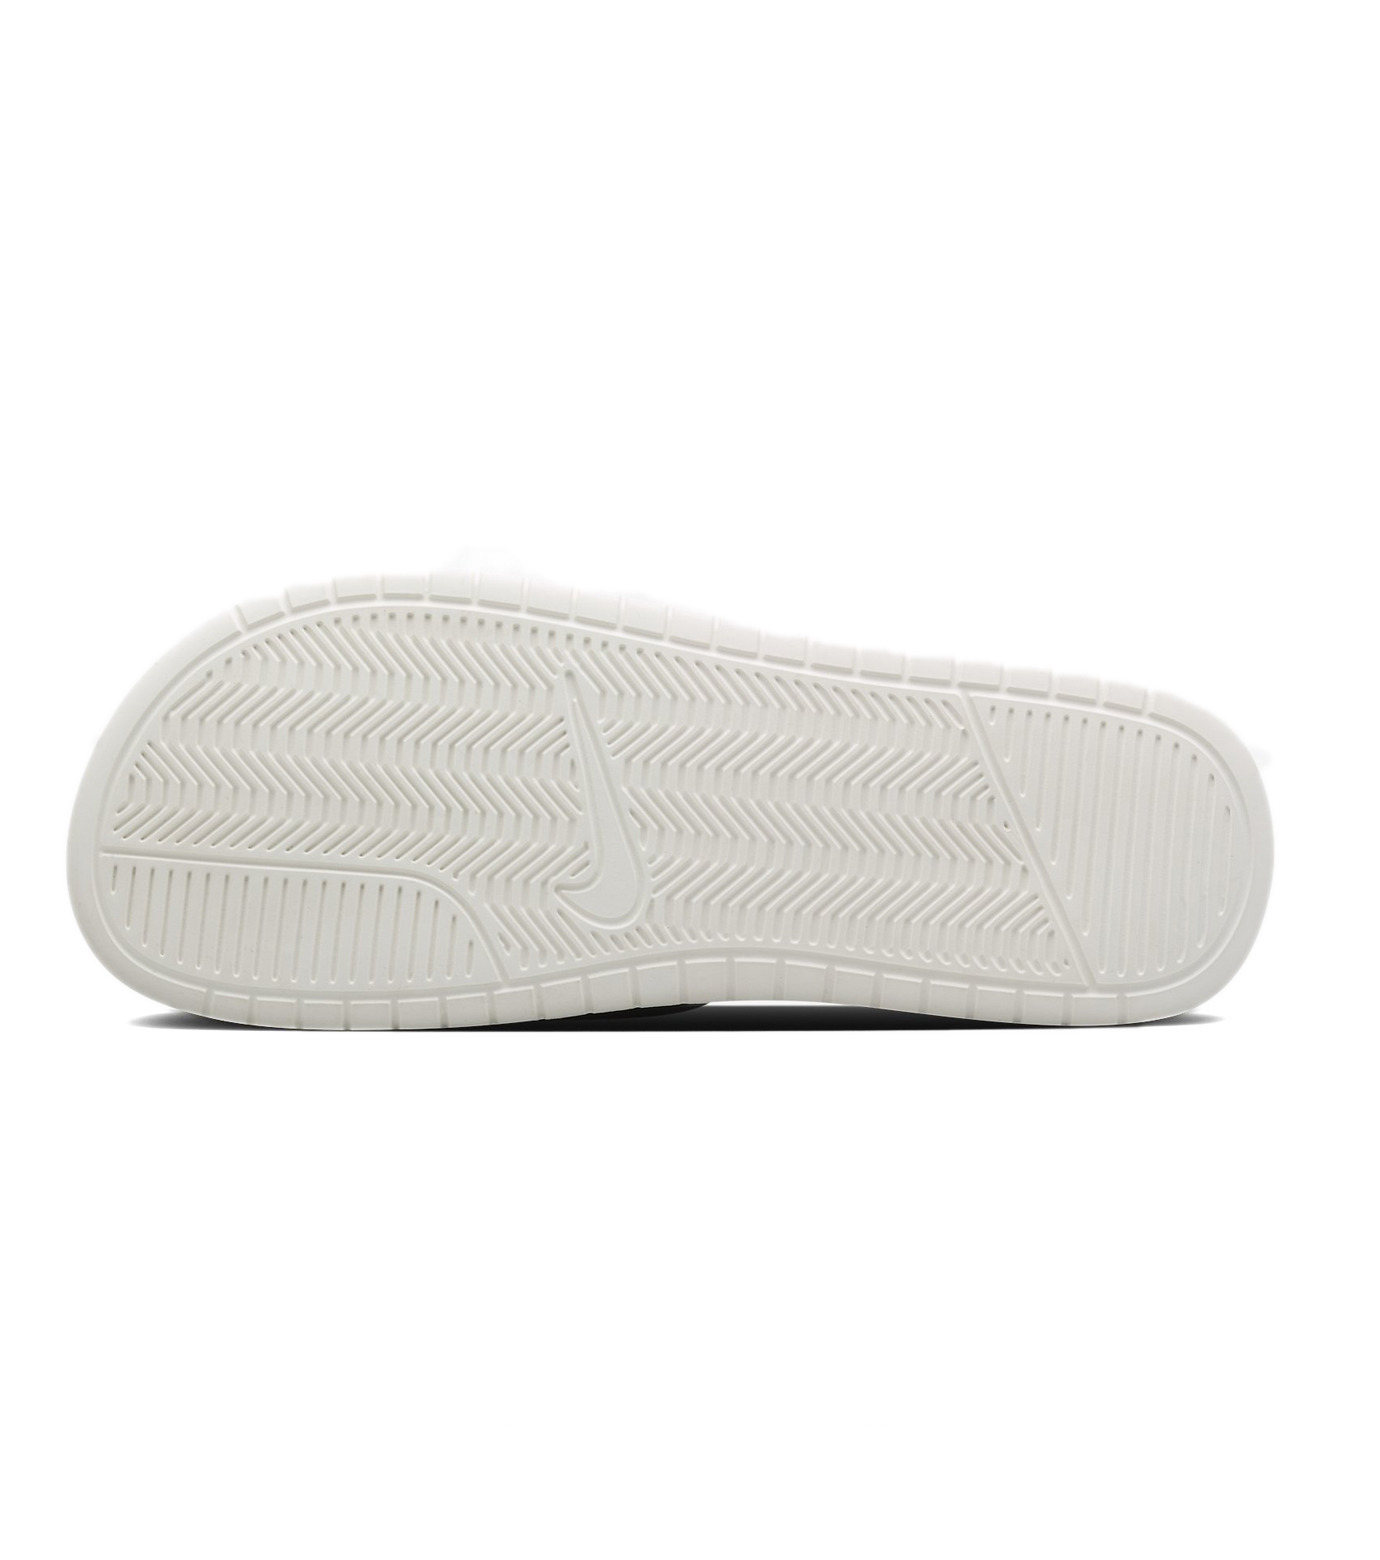 NIKE(ナイキ)のWMNS BENASSI SLIDE LUX-BLACK(シューズ/shoes)-818738-001-13 拡大詳細画像2